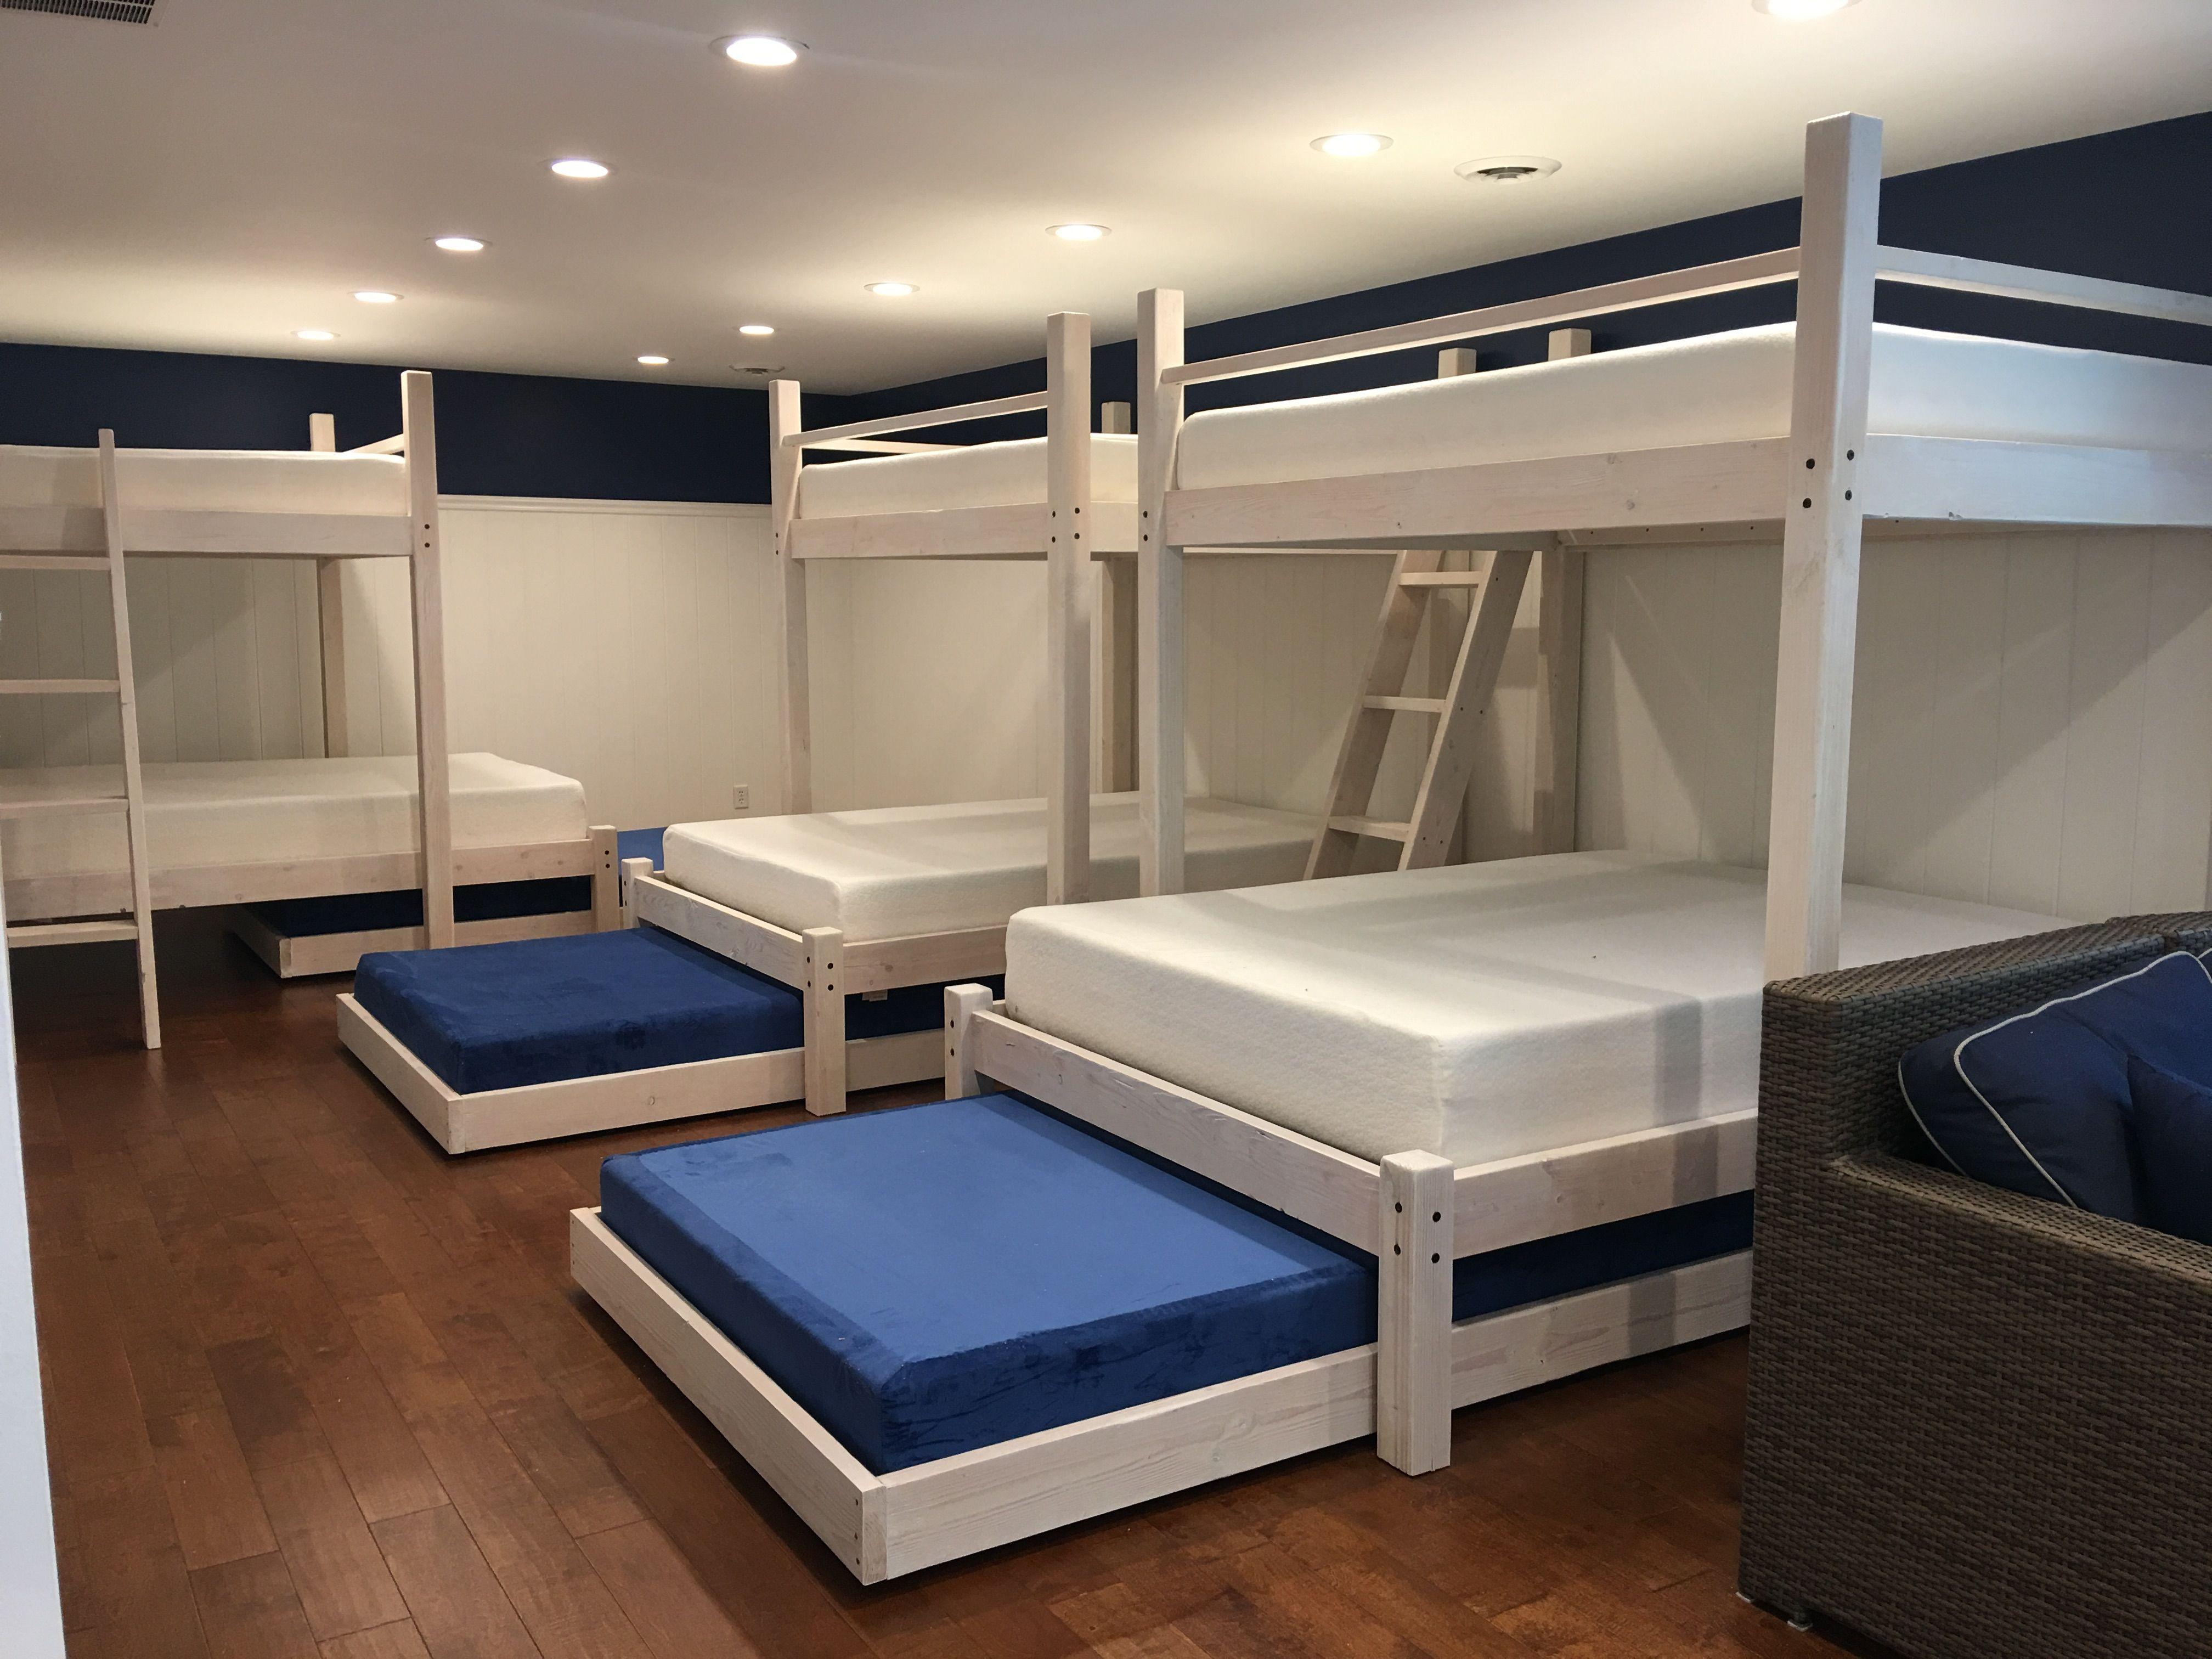 Custom Full Over Queen Over Full Trundle Bunk Beds